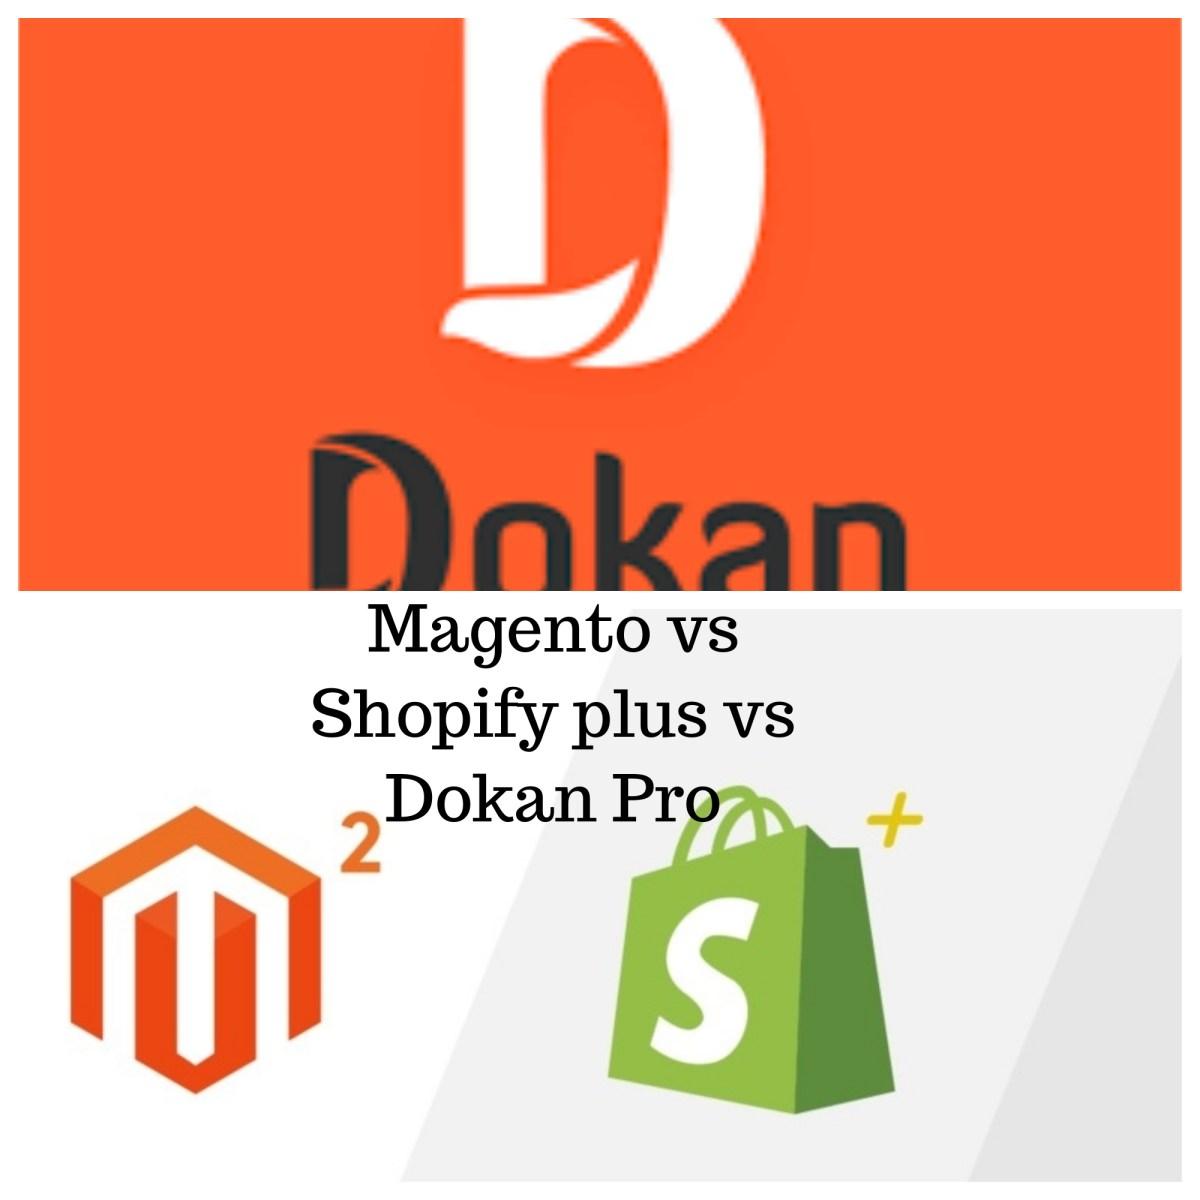 Magento vs Shopify Plus vs Dokan Pro: The Enterprise eCommerce Standoff